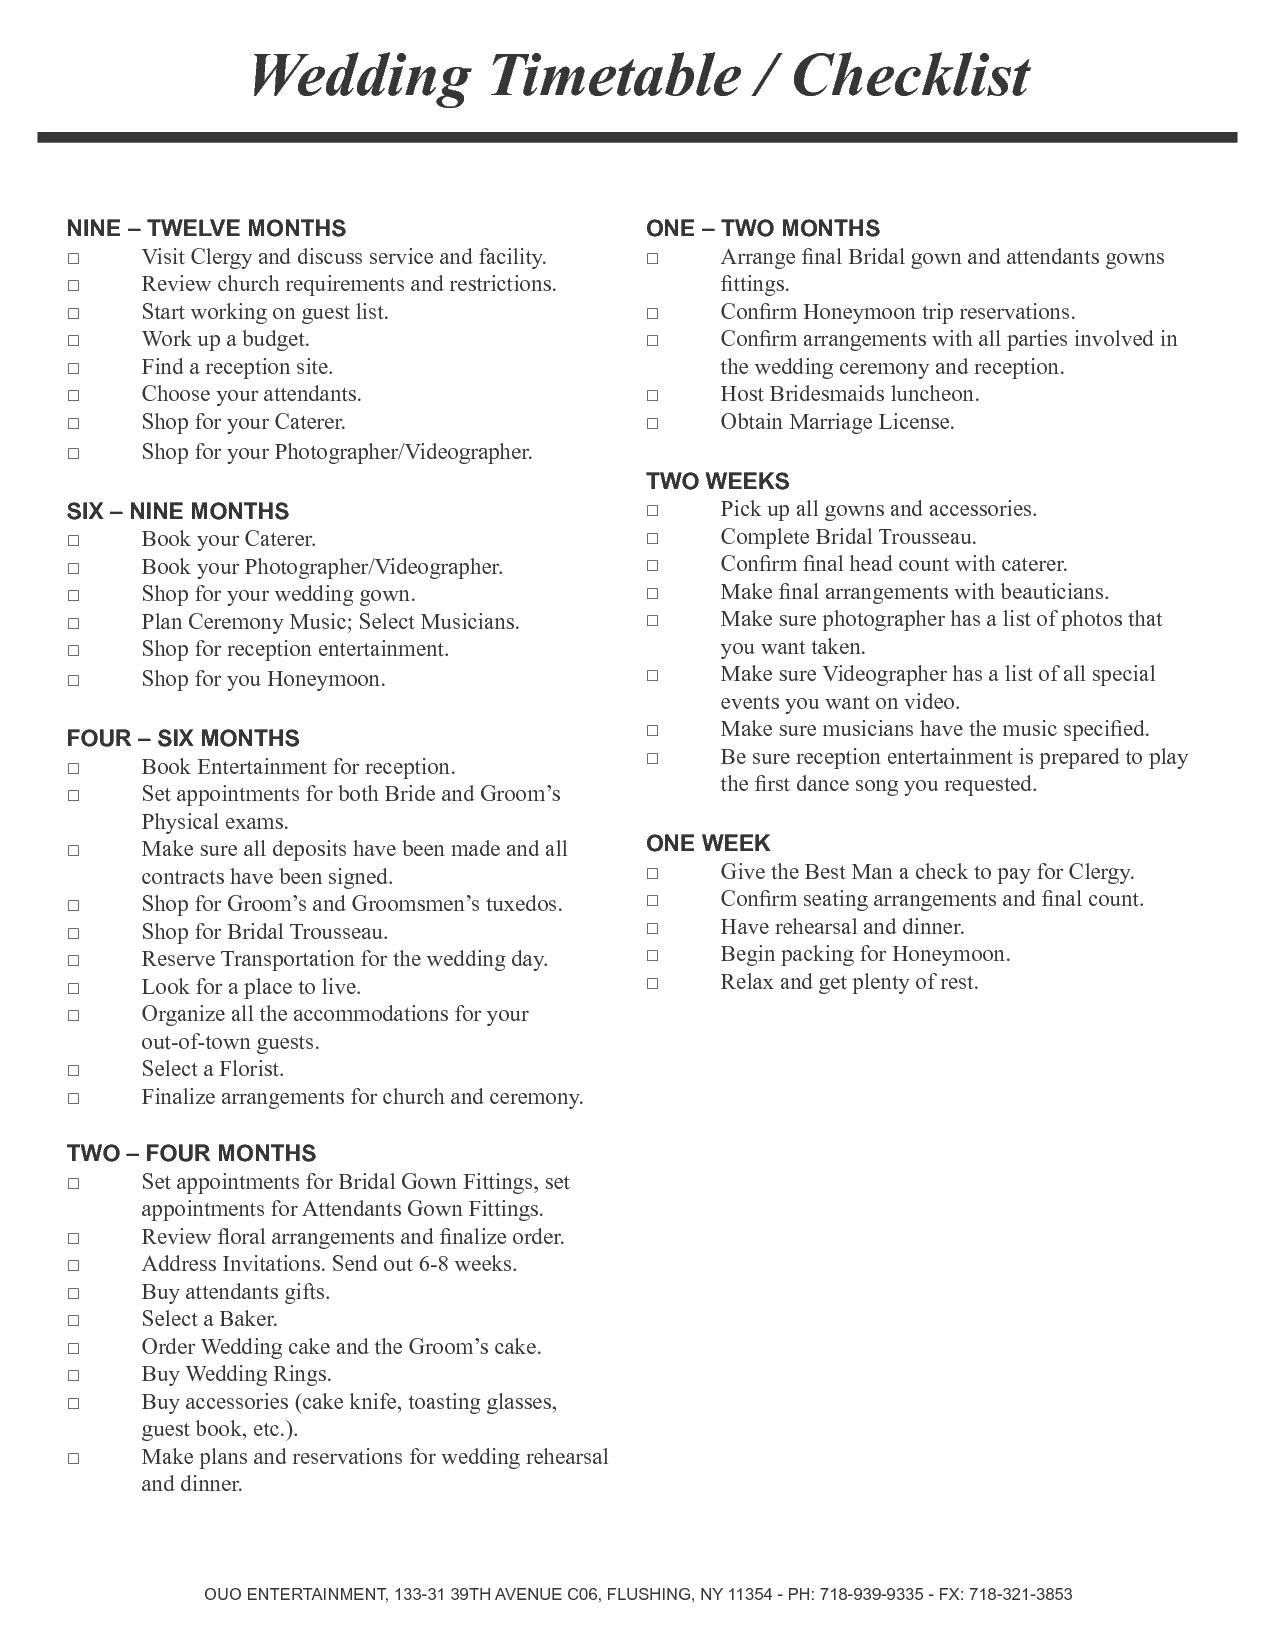 Wedding Ceremony Checklist Timetable